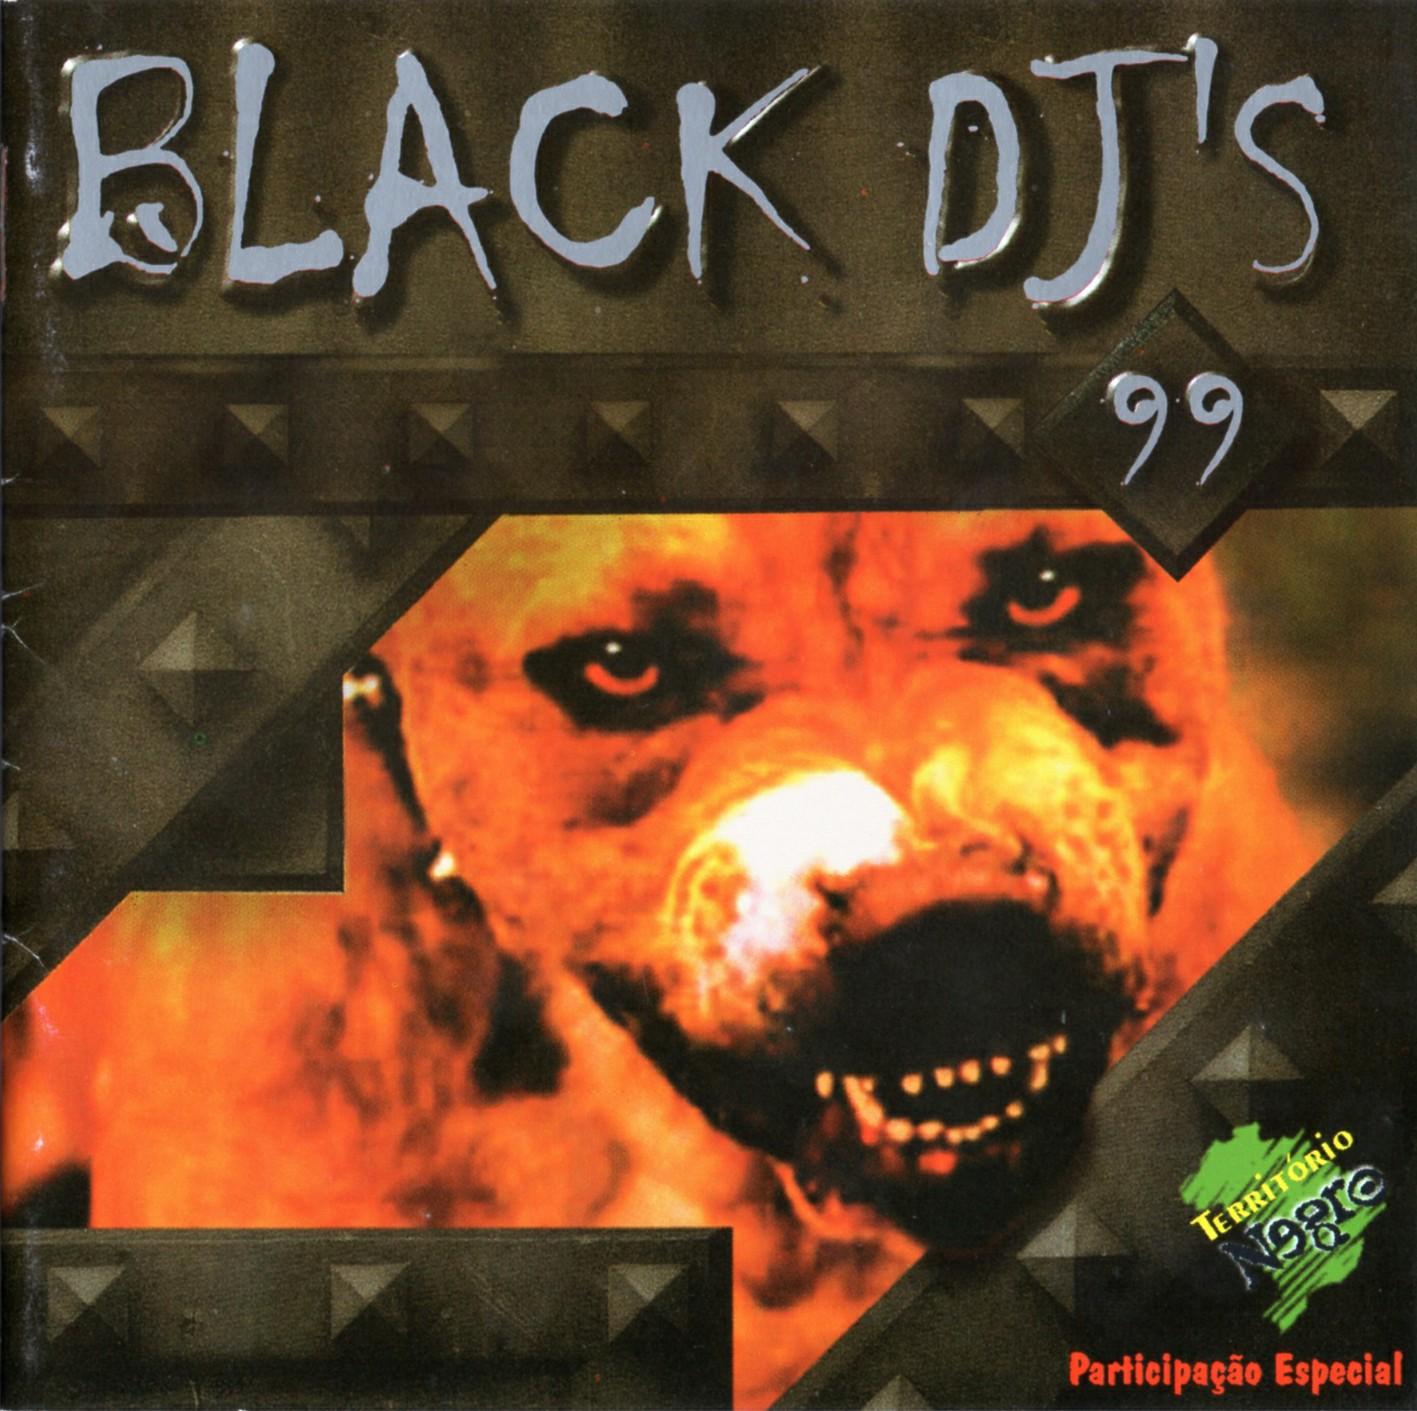 BLACK DJS 99